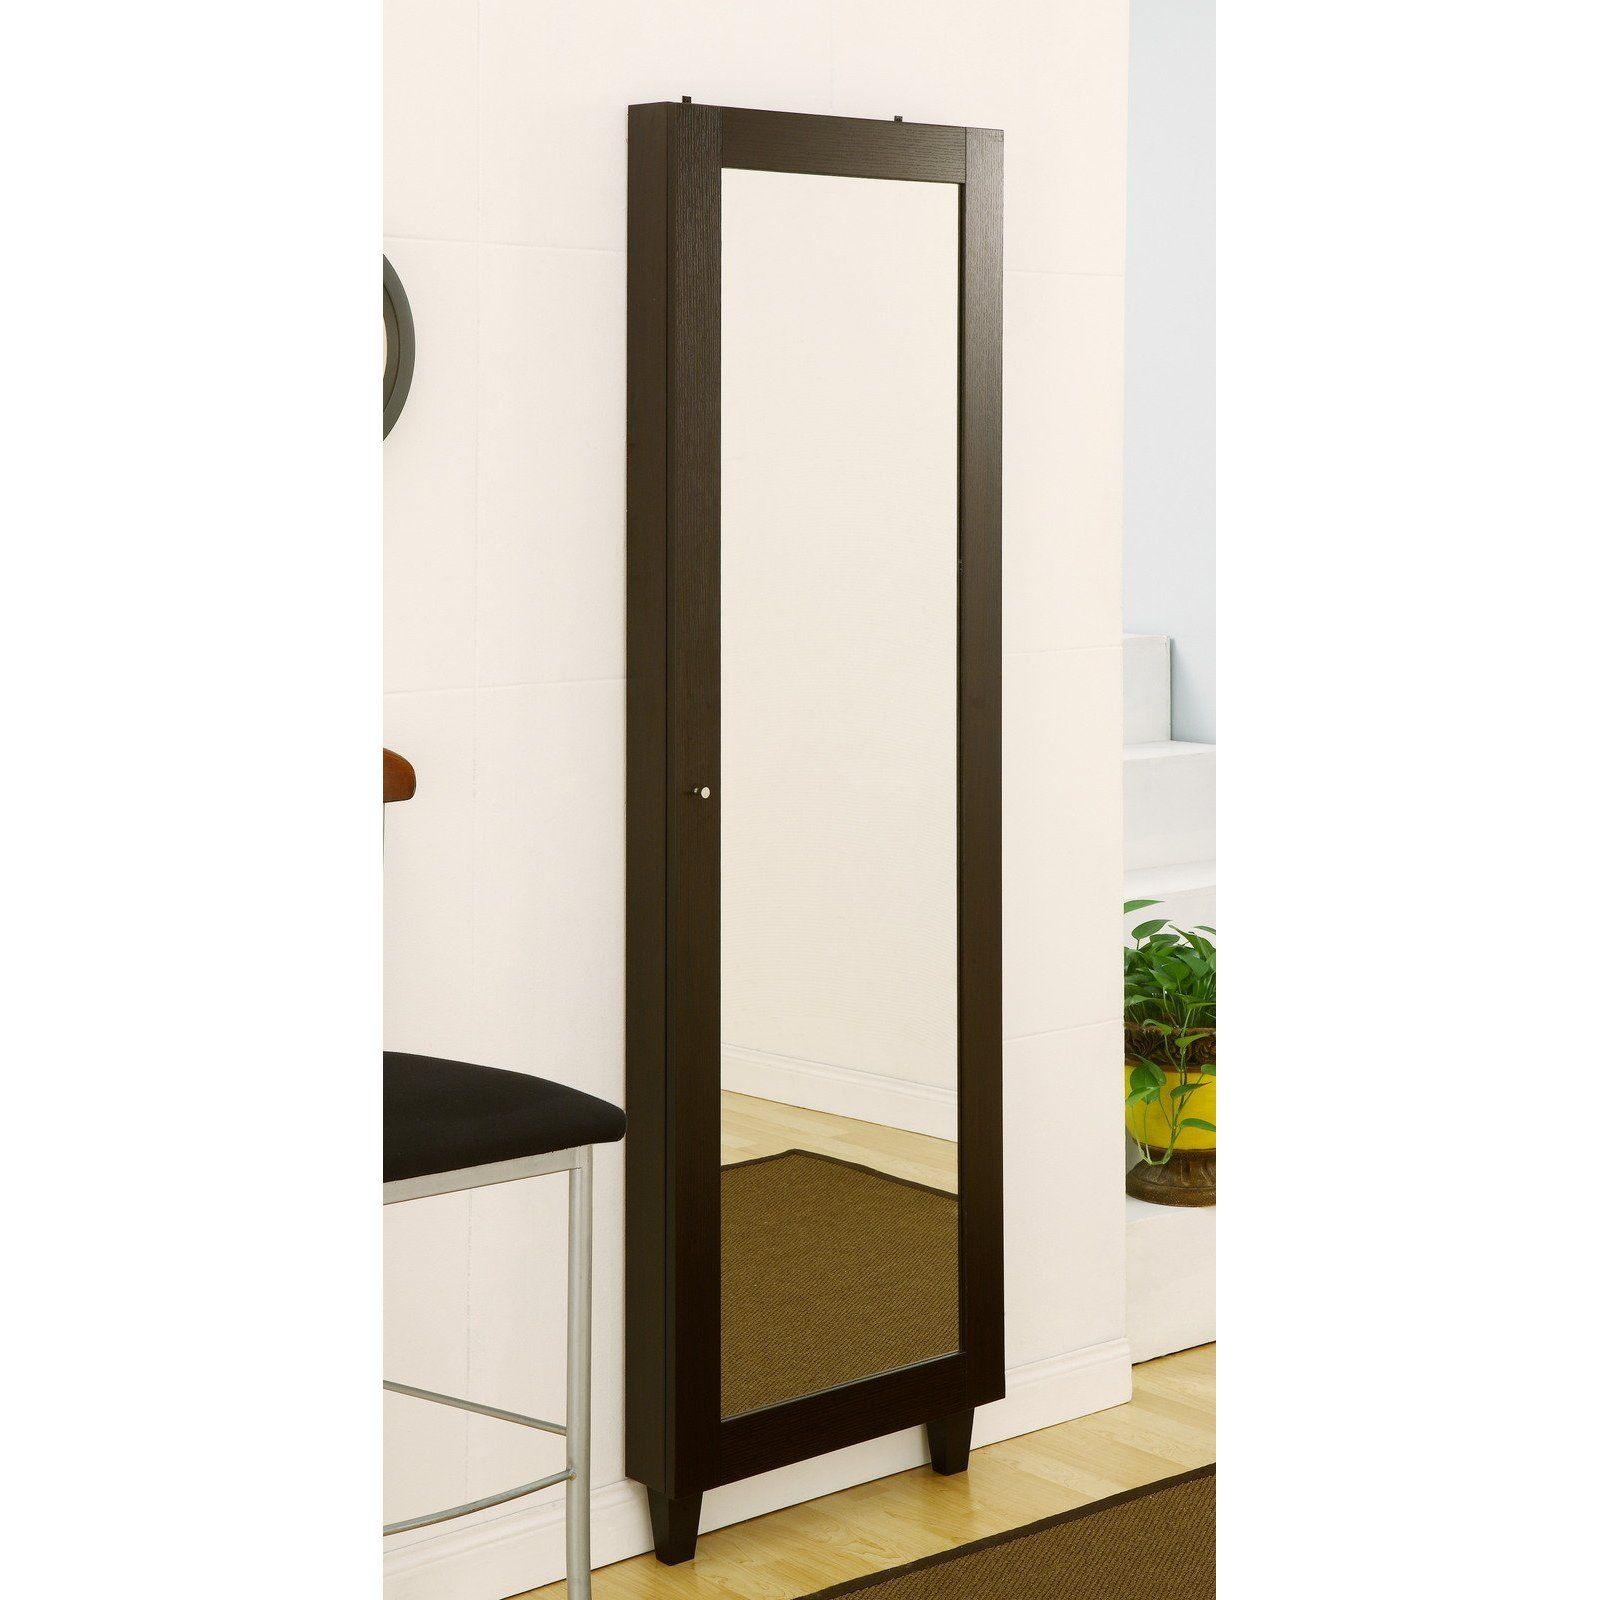 Furnituremaxx Clara Wall Mount Mirrors With Jewelry Armoire Floor